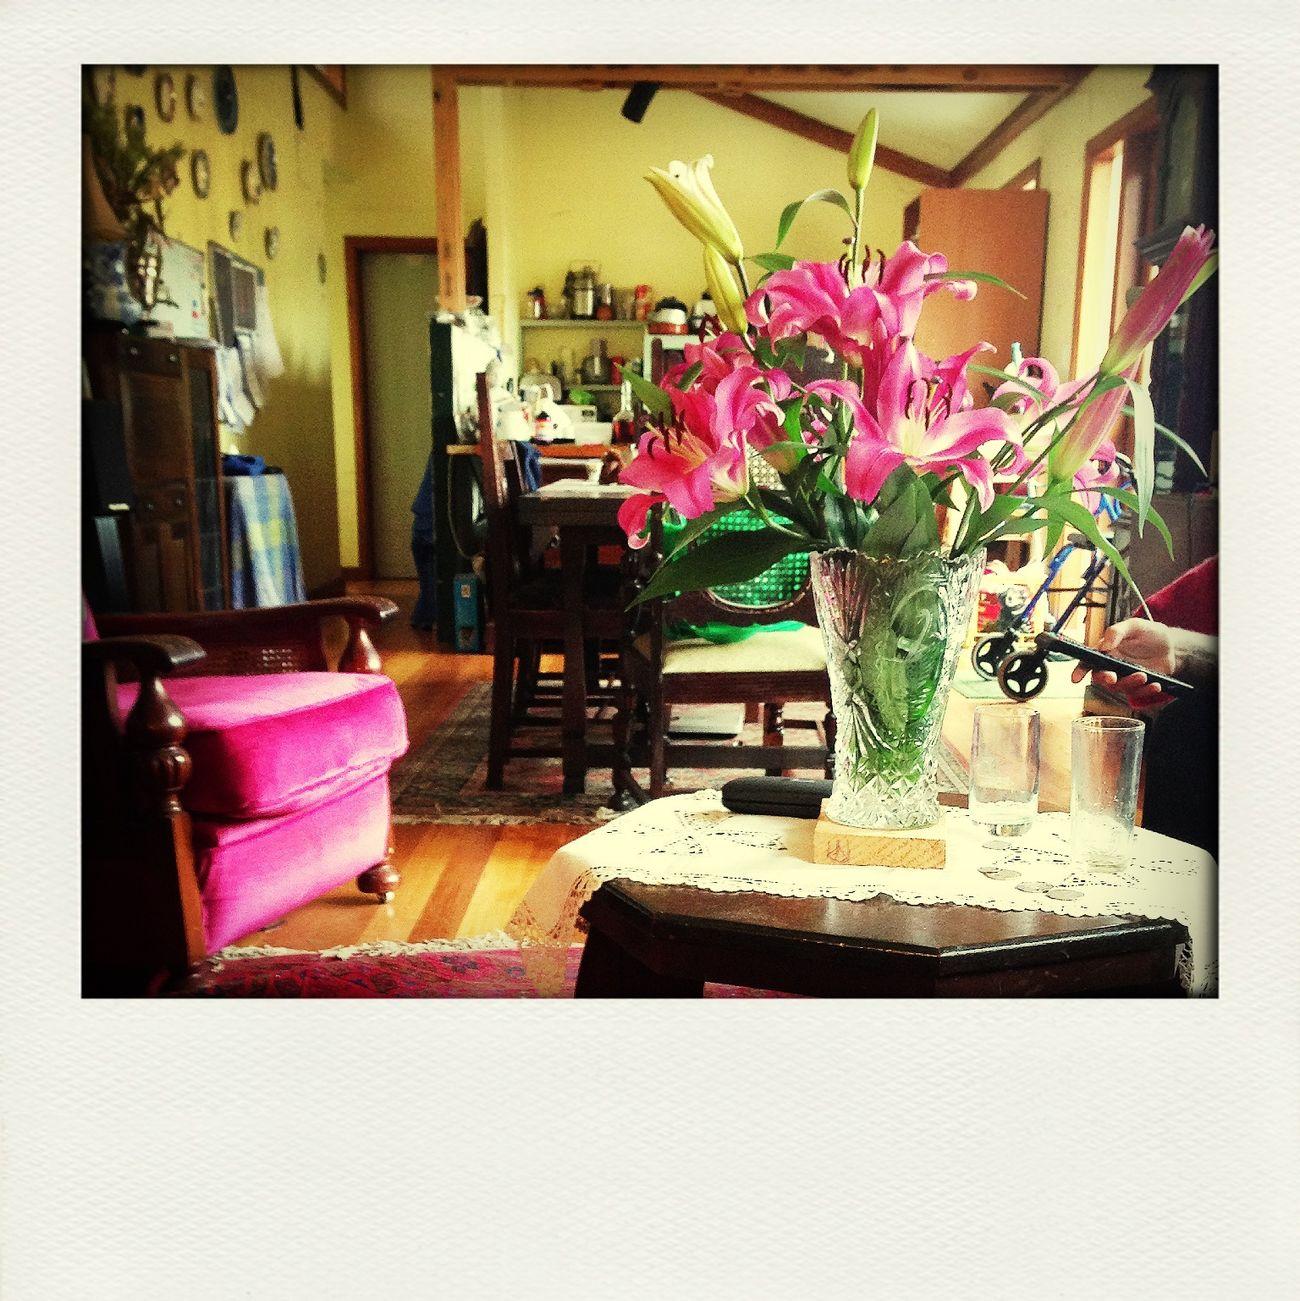 I love having fresh flowers around the house